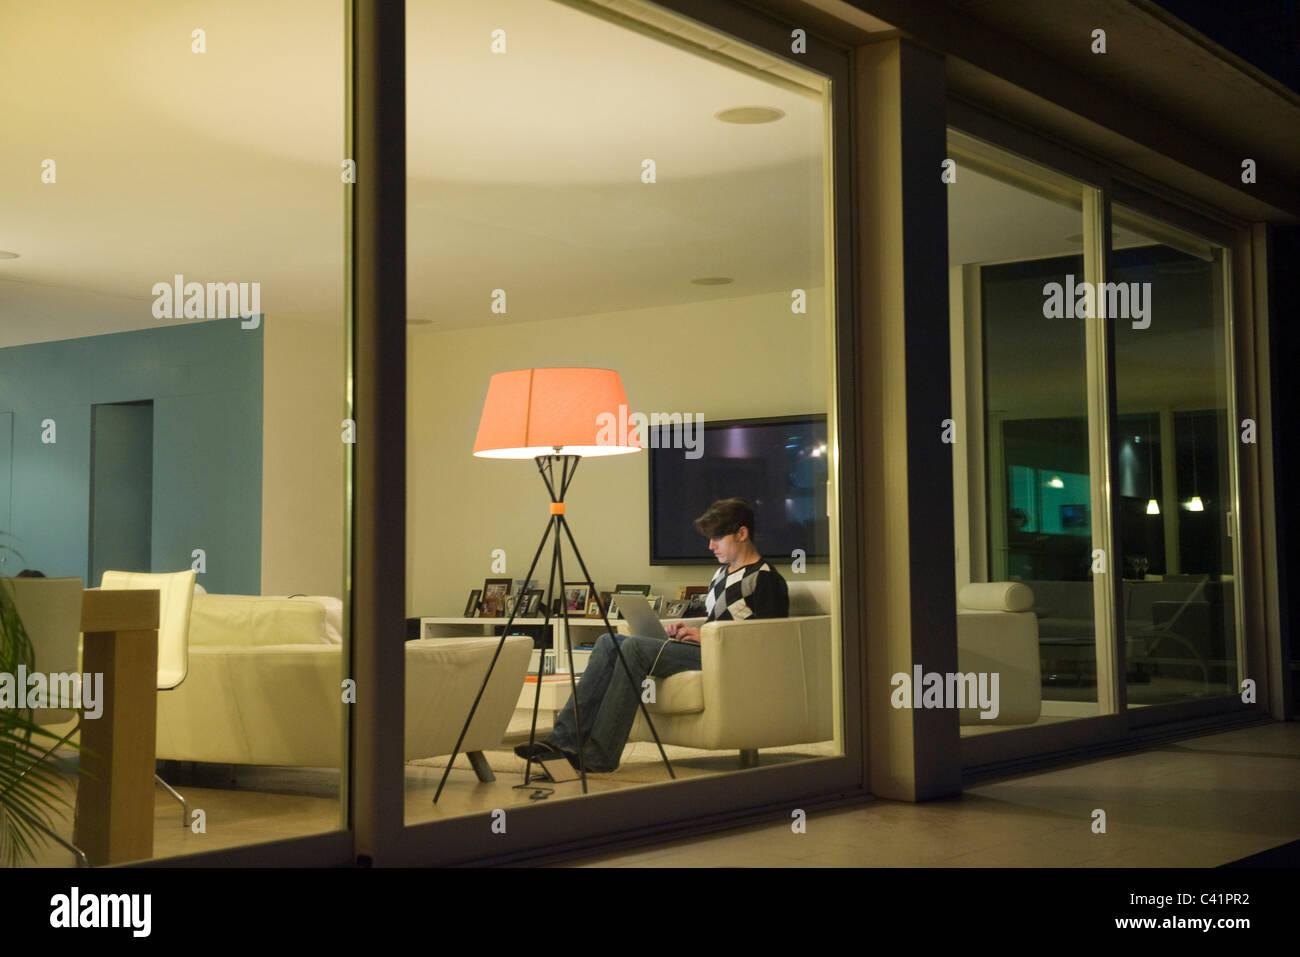 Man using laptop in living room, viewed through window - Stock Image